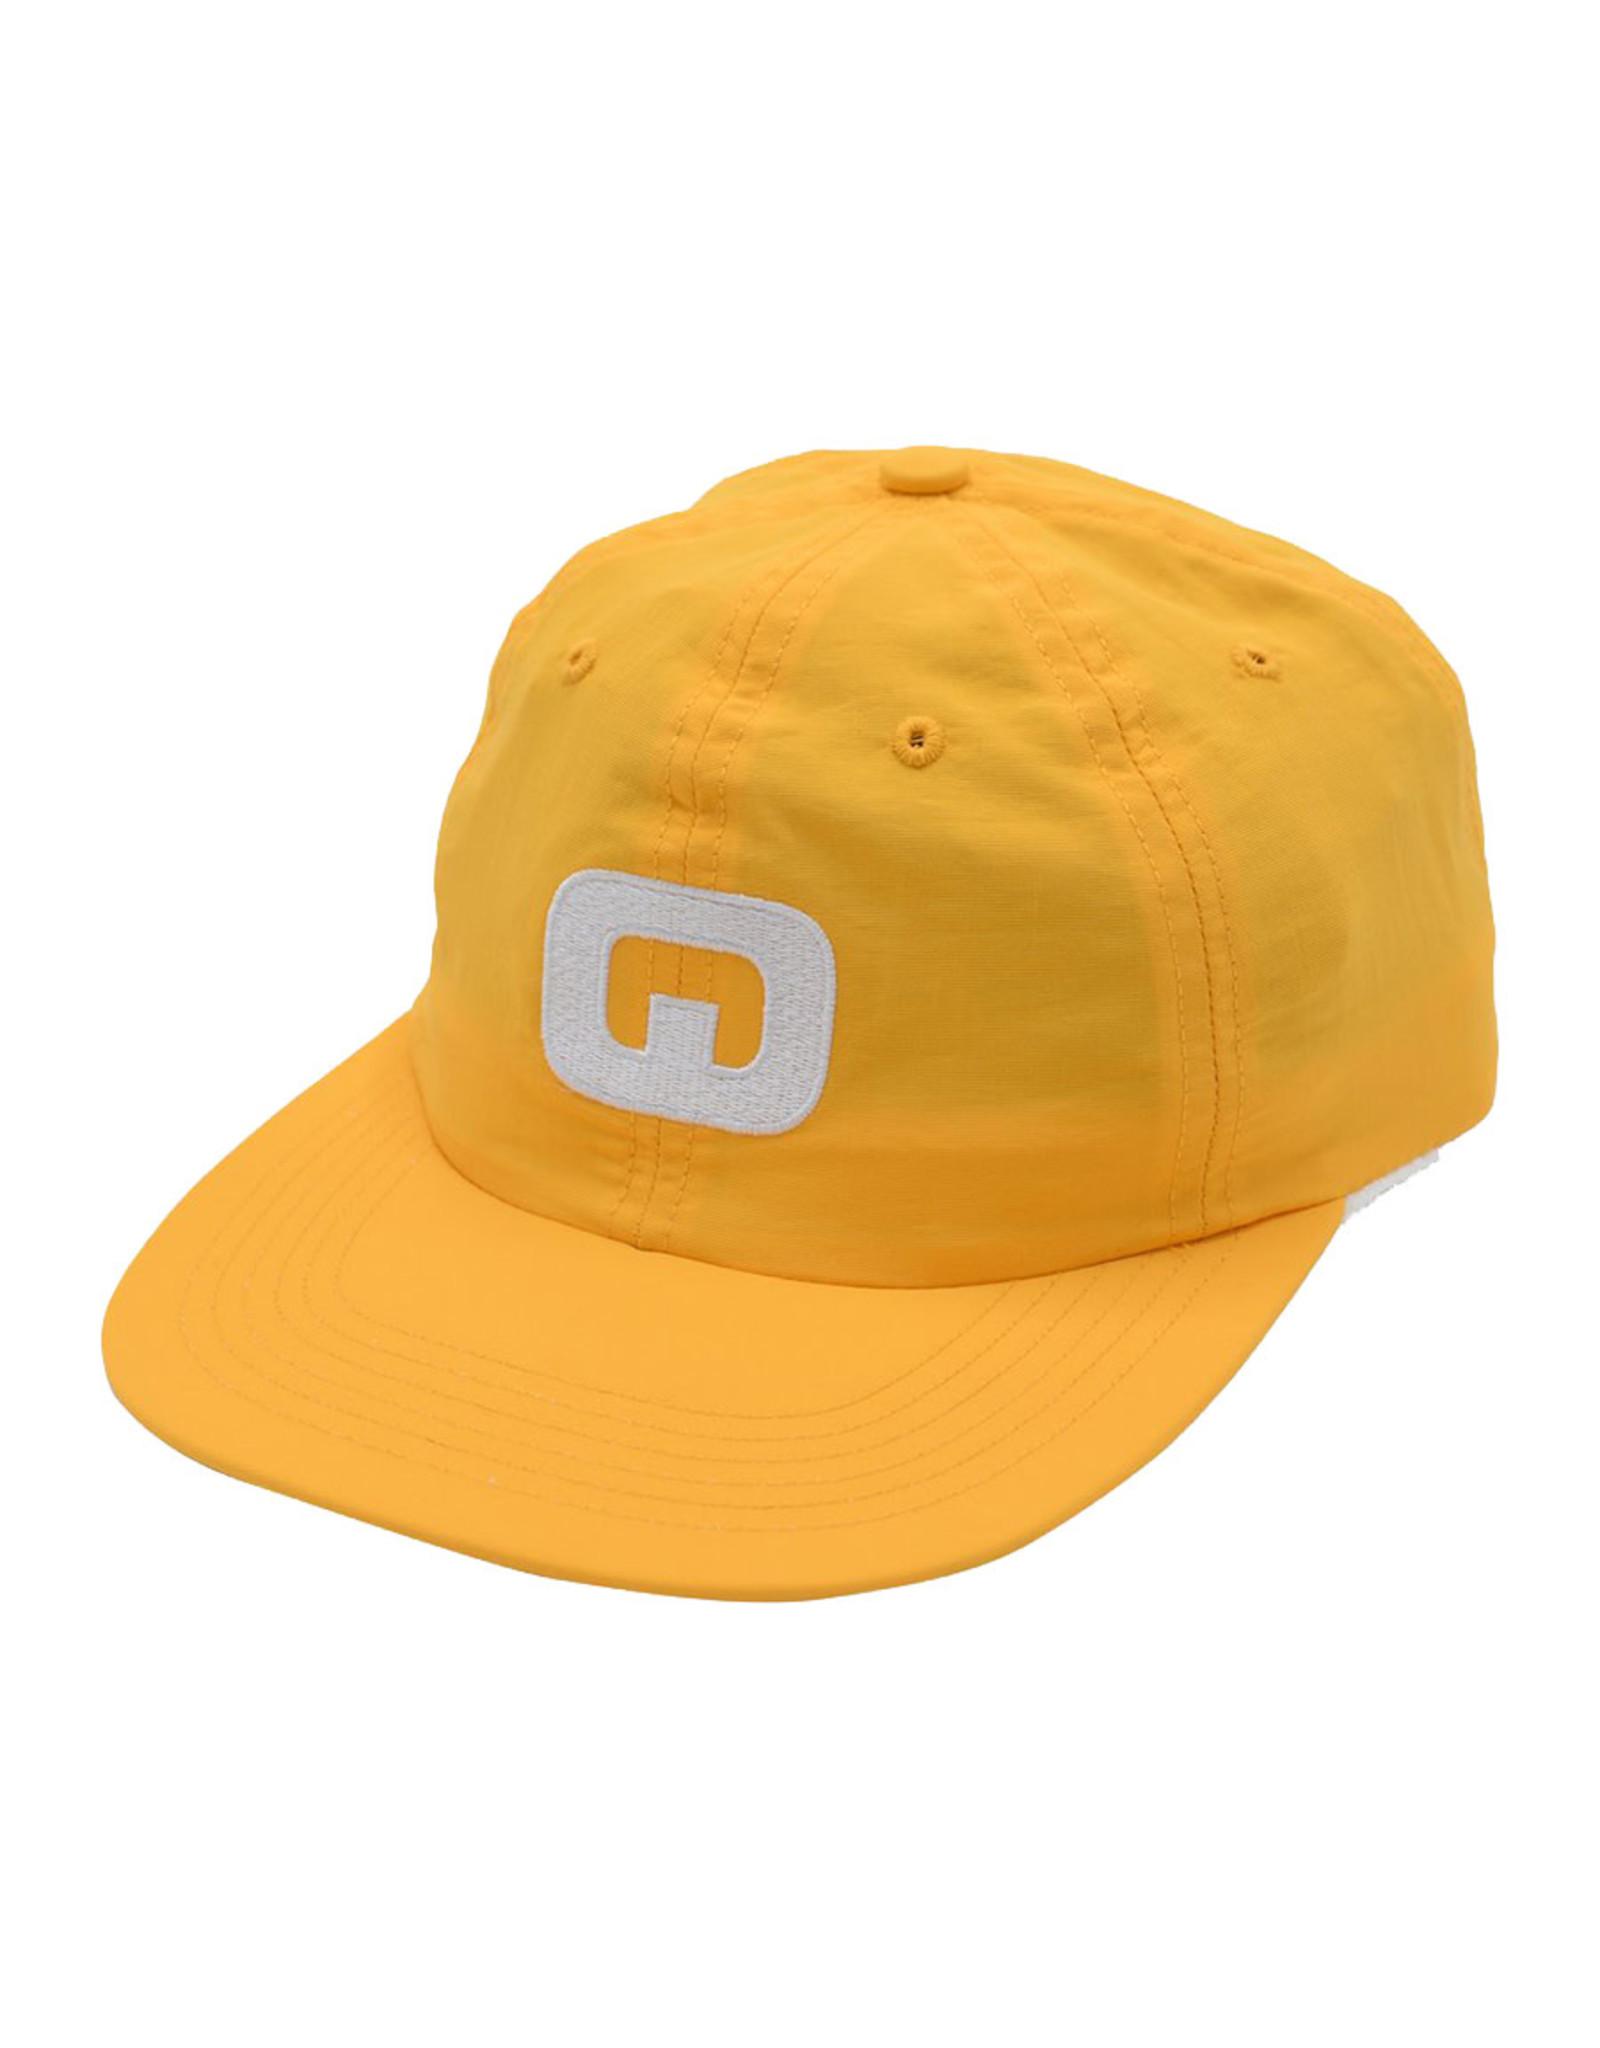 Quasi Skateboards Quasi Hat 6 Panel Letter Snapback (Gold)